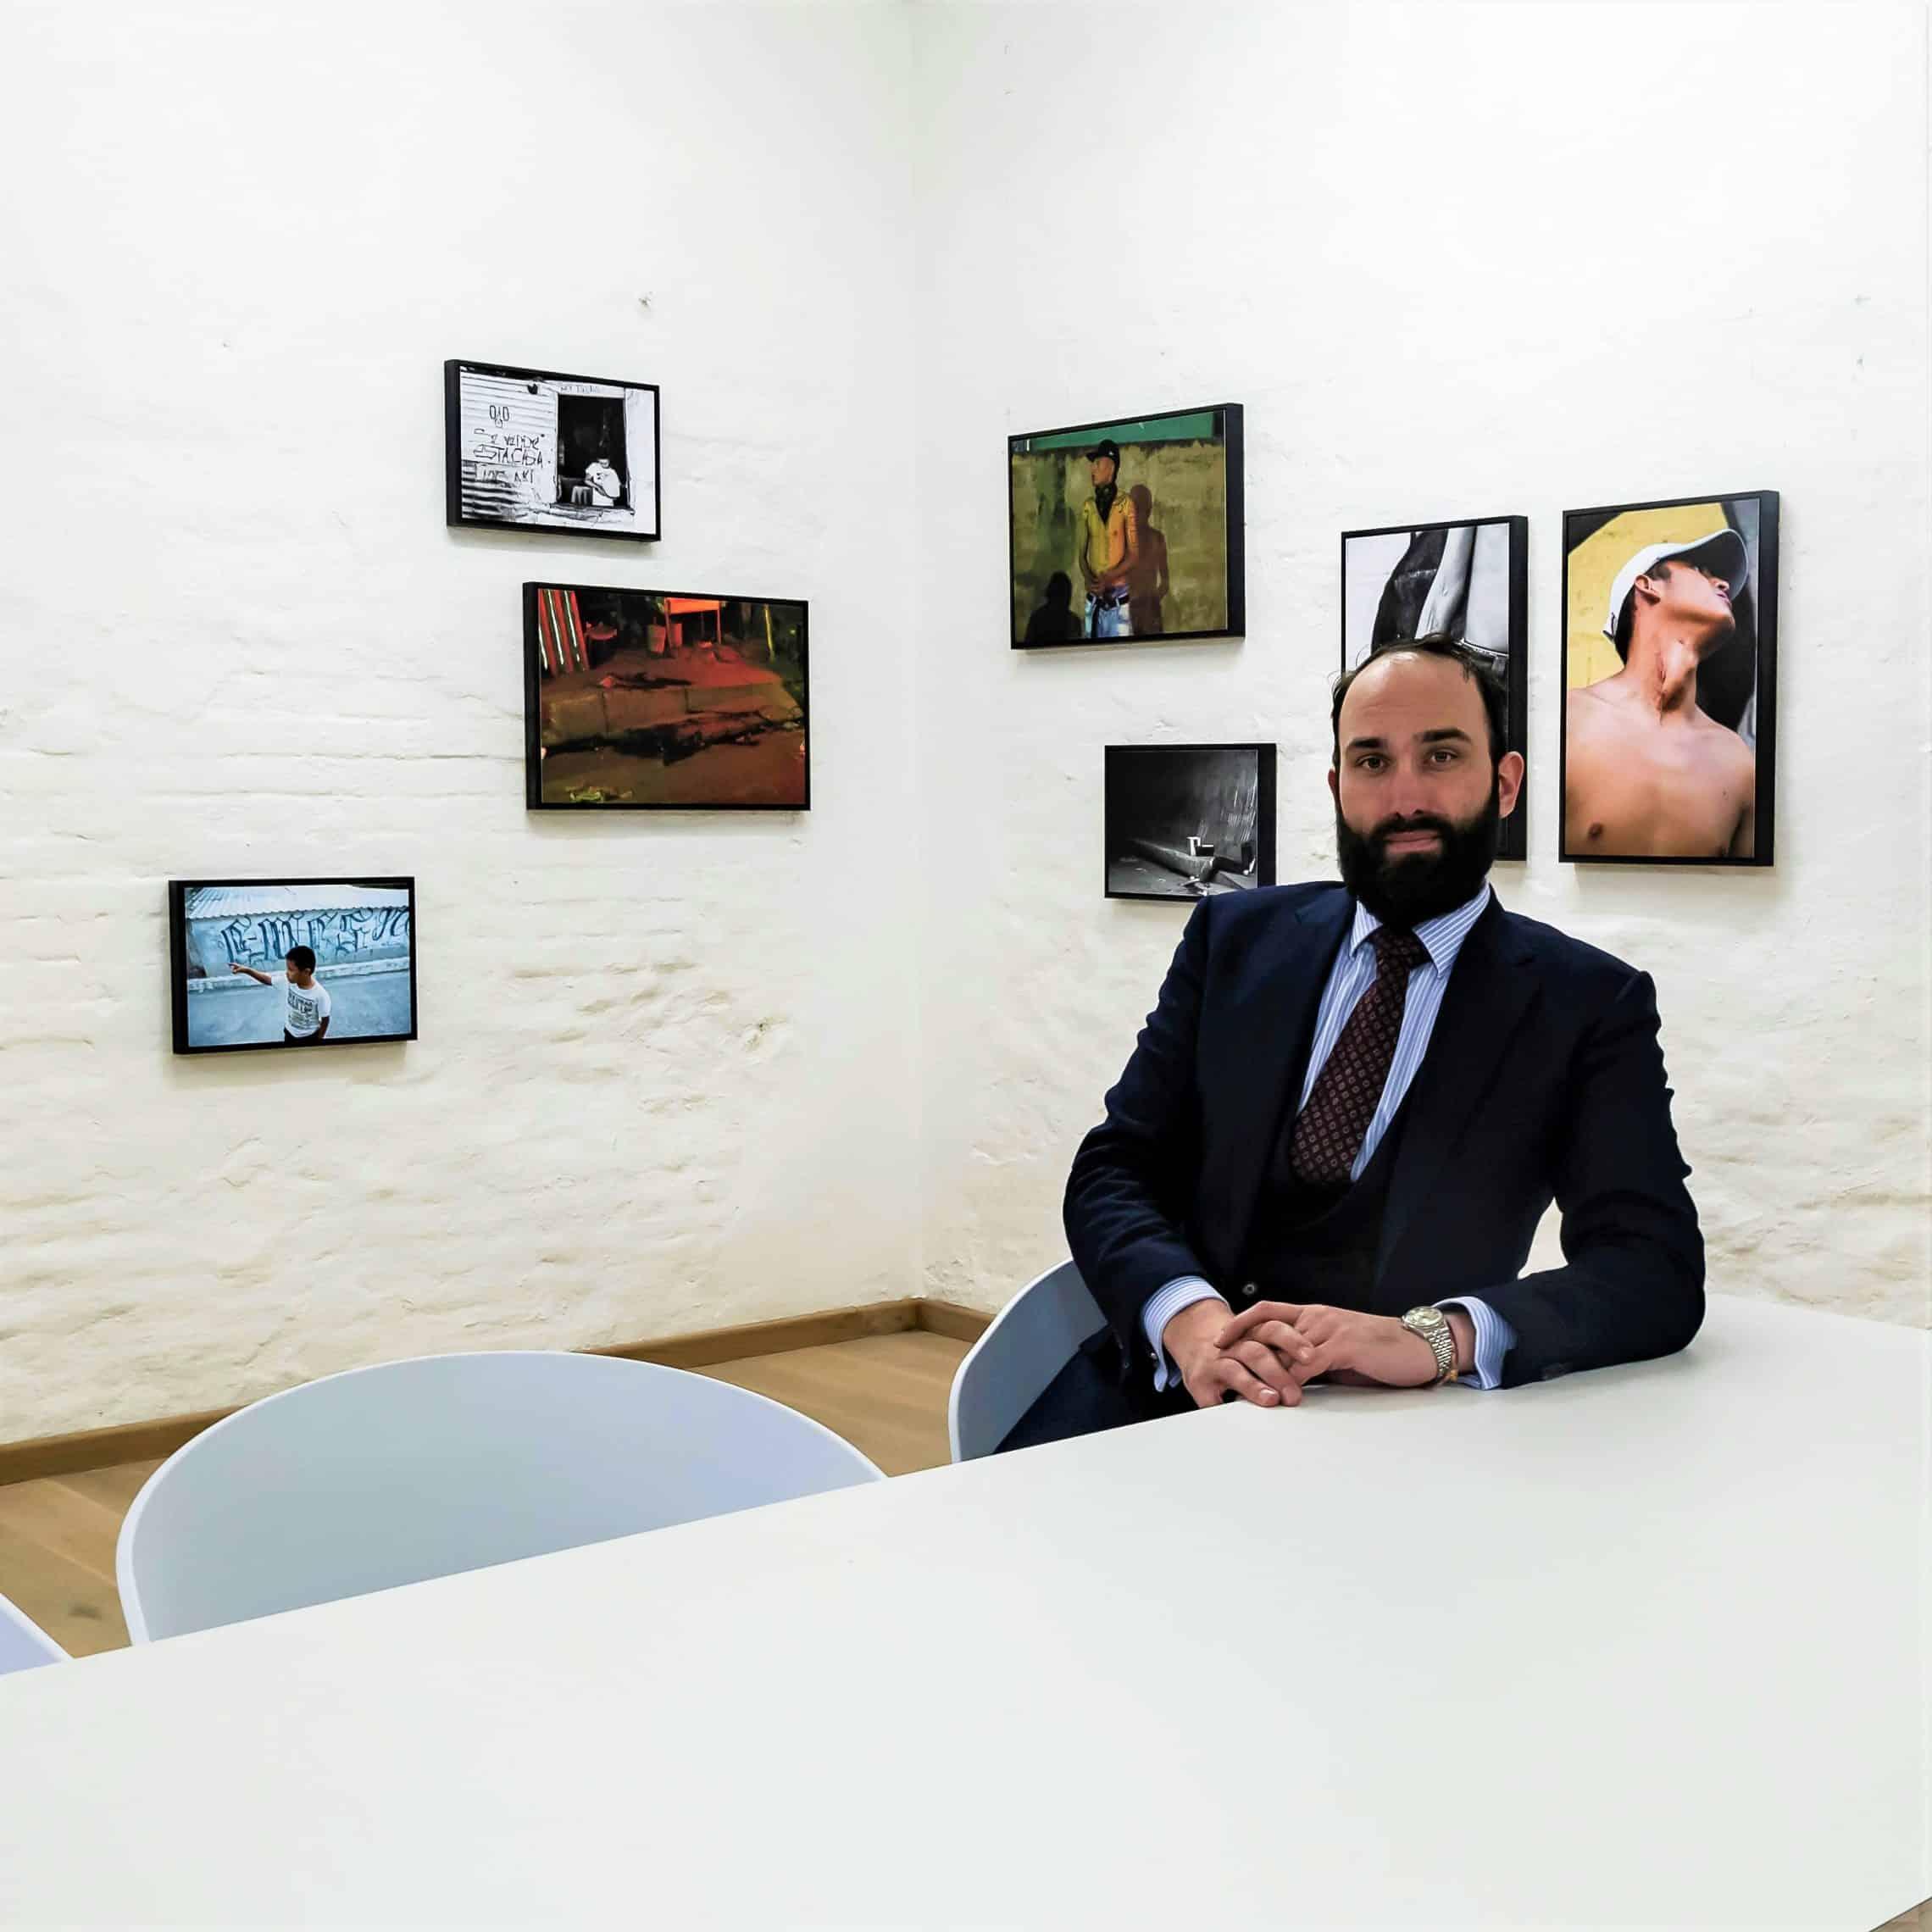 Style Hannover Galerie Metavier Inhaber - Galerie Metavier: Vom Anfang – und Ende